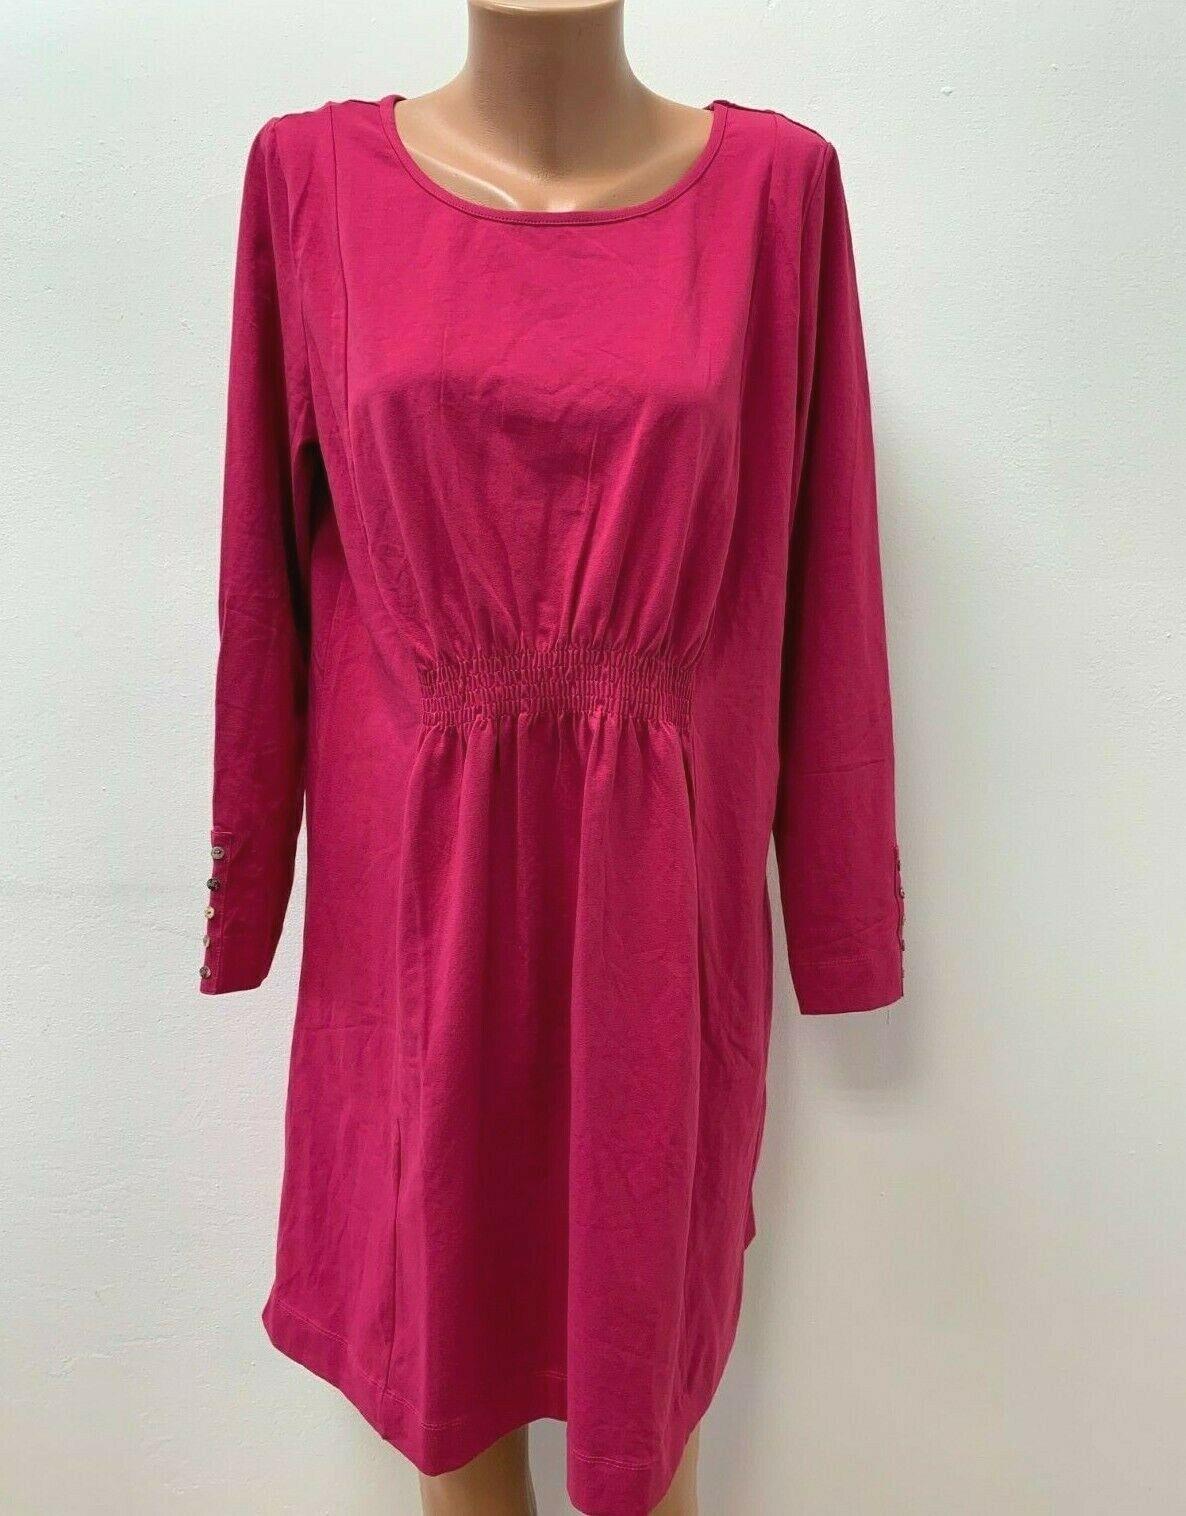 DEERBERG Gr. L Stretch Kleid Jersey Rosa Magenta Fuschia langarm